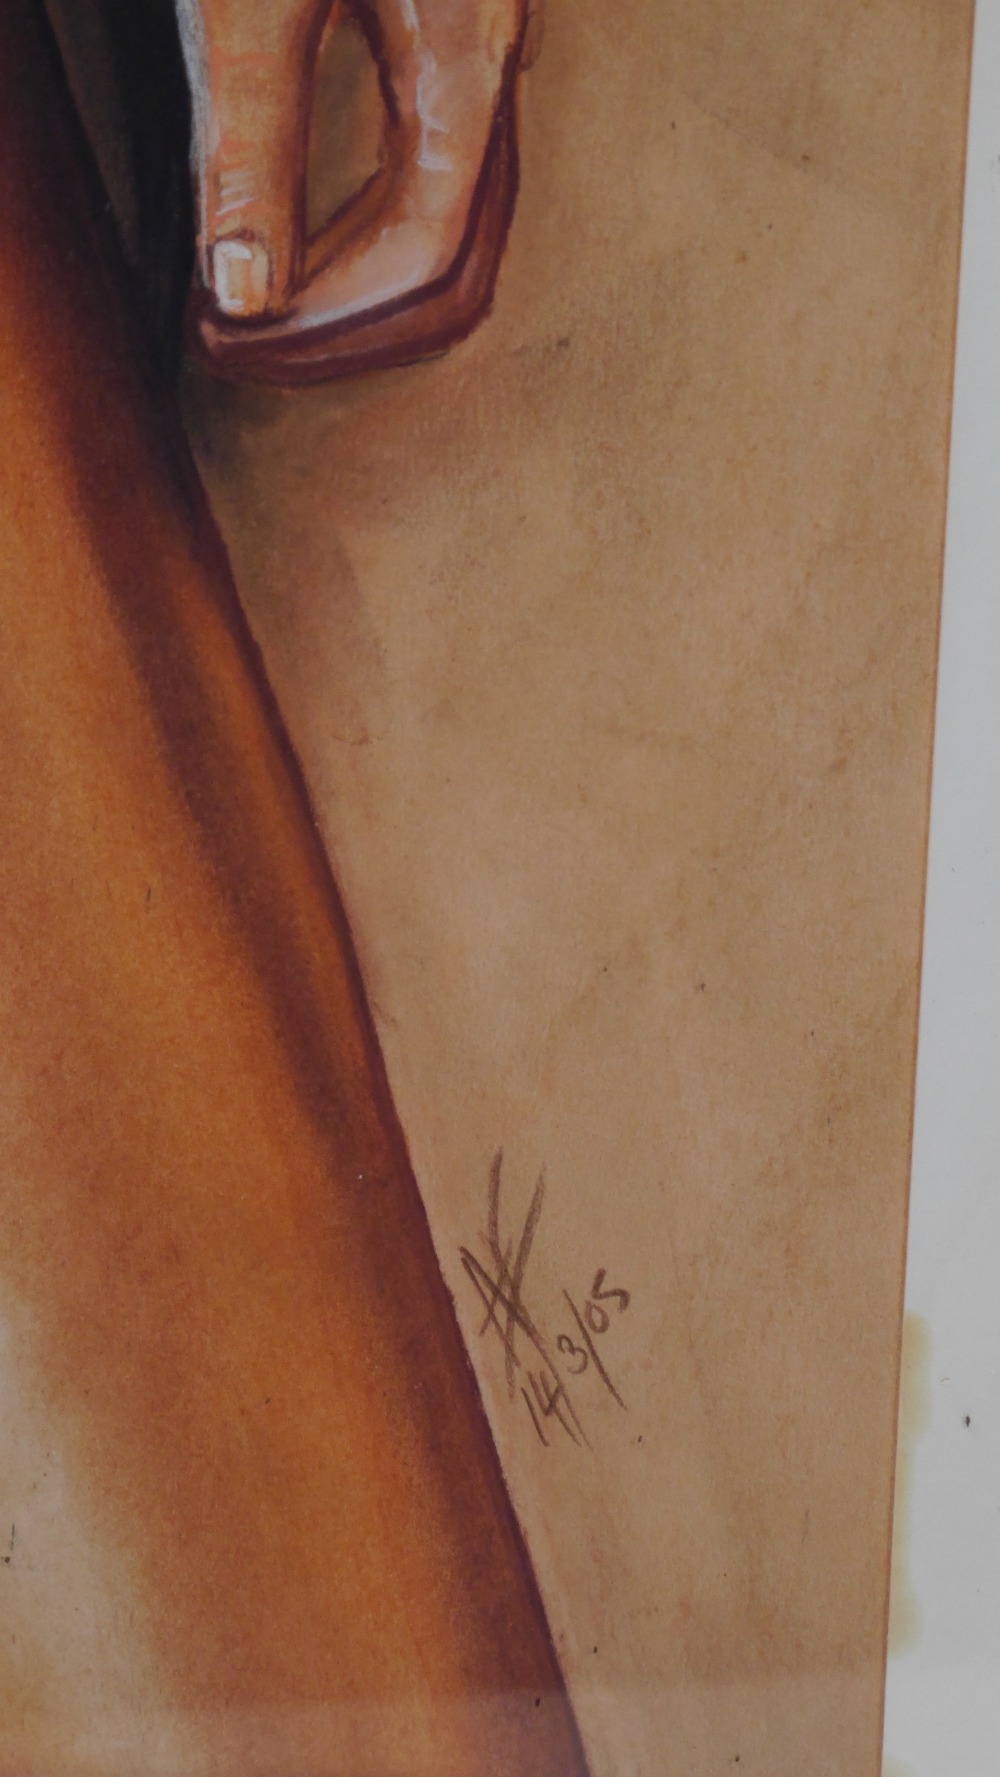 Lot 2 - Nude Art - Portrait of a Nude Female Signed AF